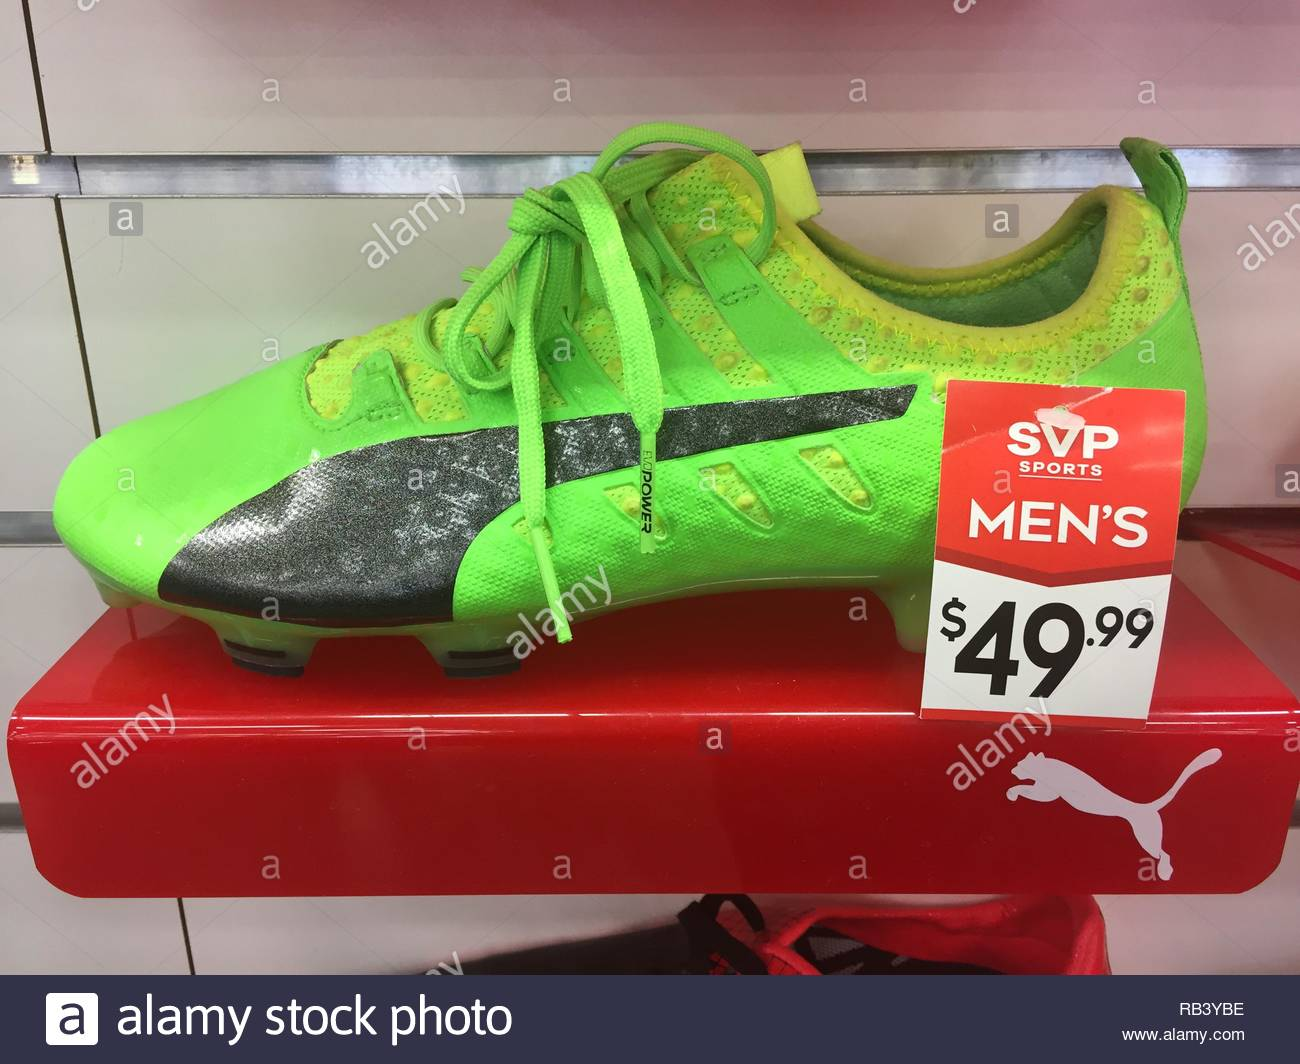 Football Shoes Imágenes De Stock   Football Shoes Fotos De Stock - Alamy 3fa6ddfc545b3